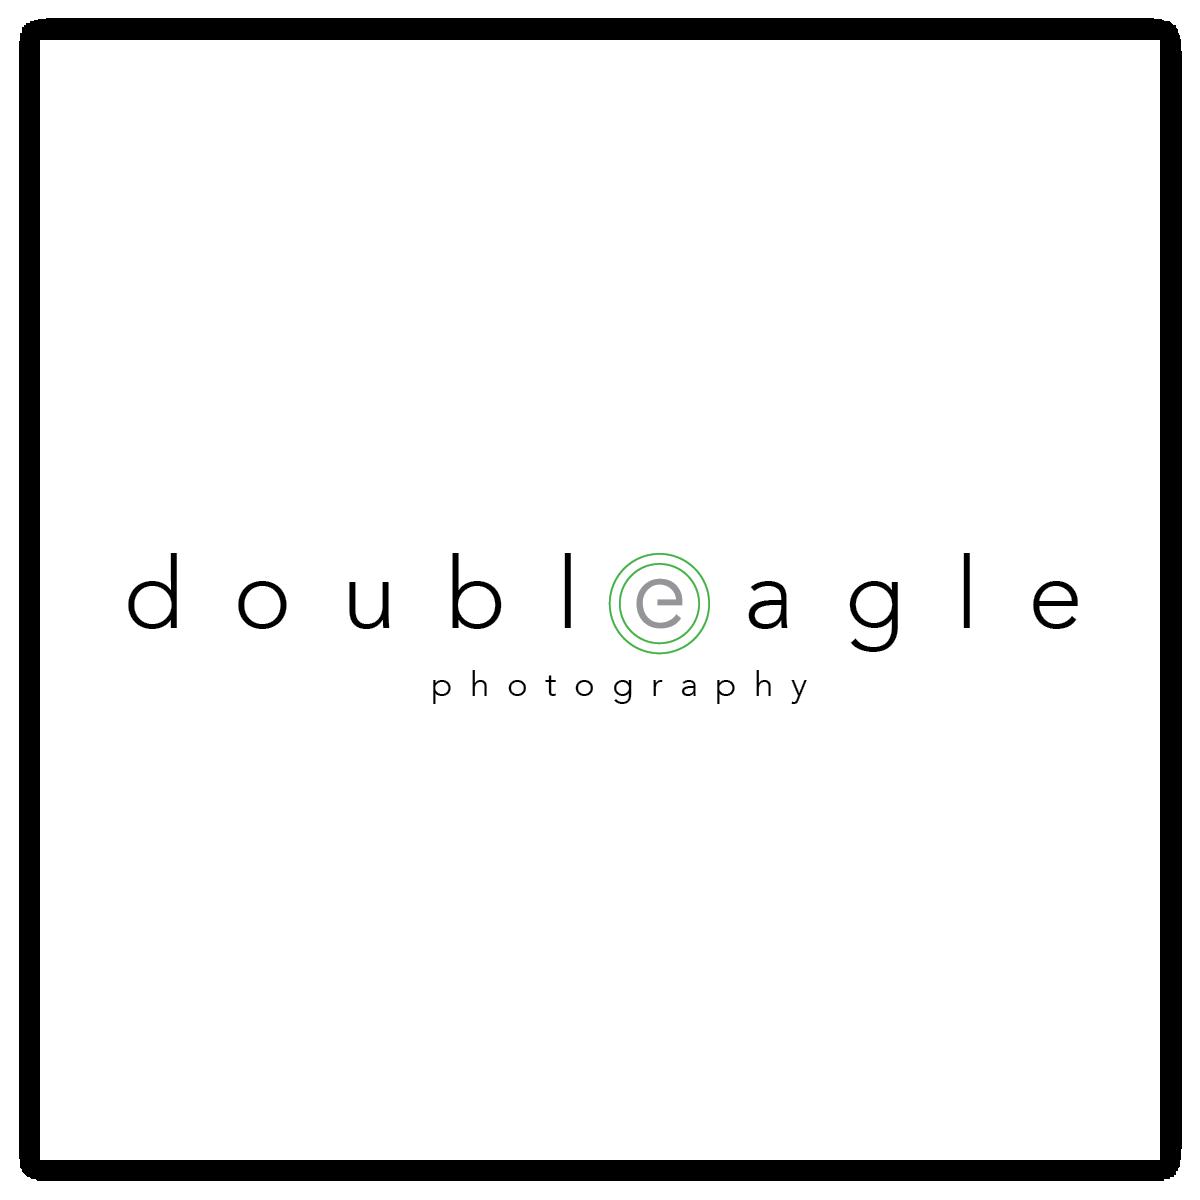 Logo Images5.png